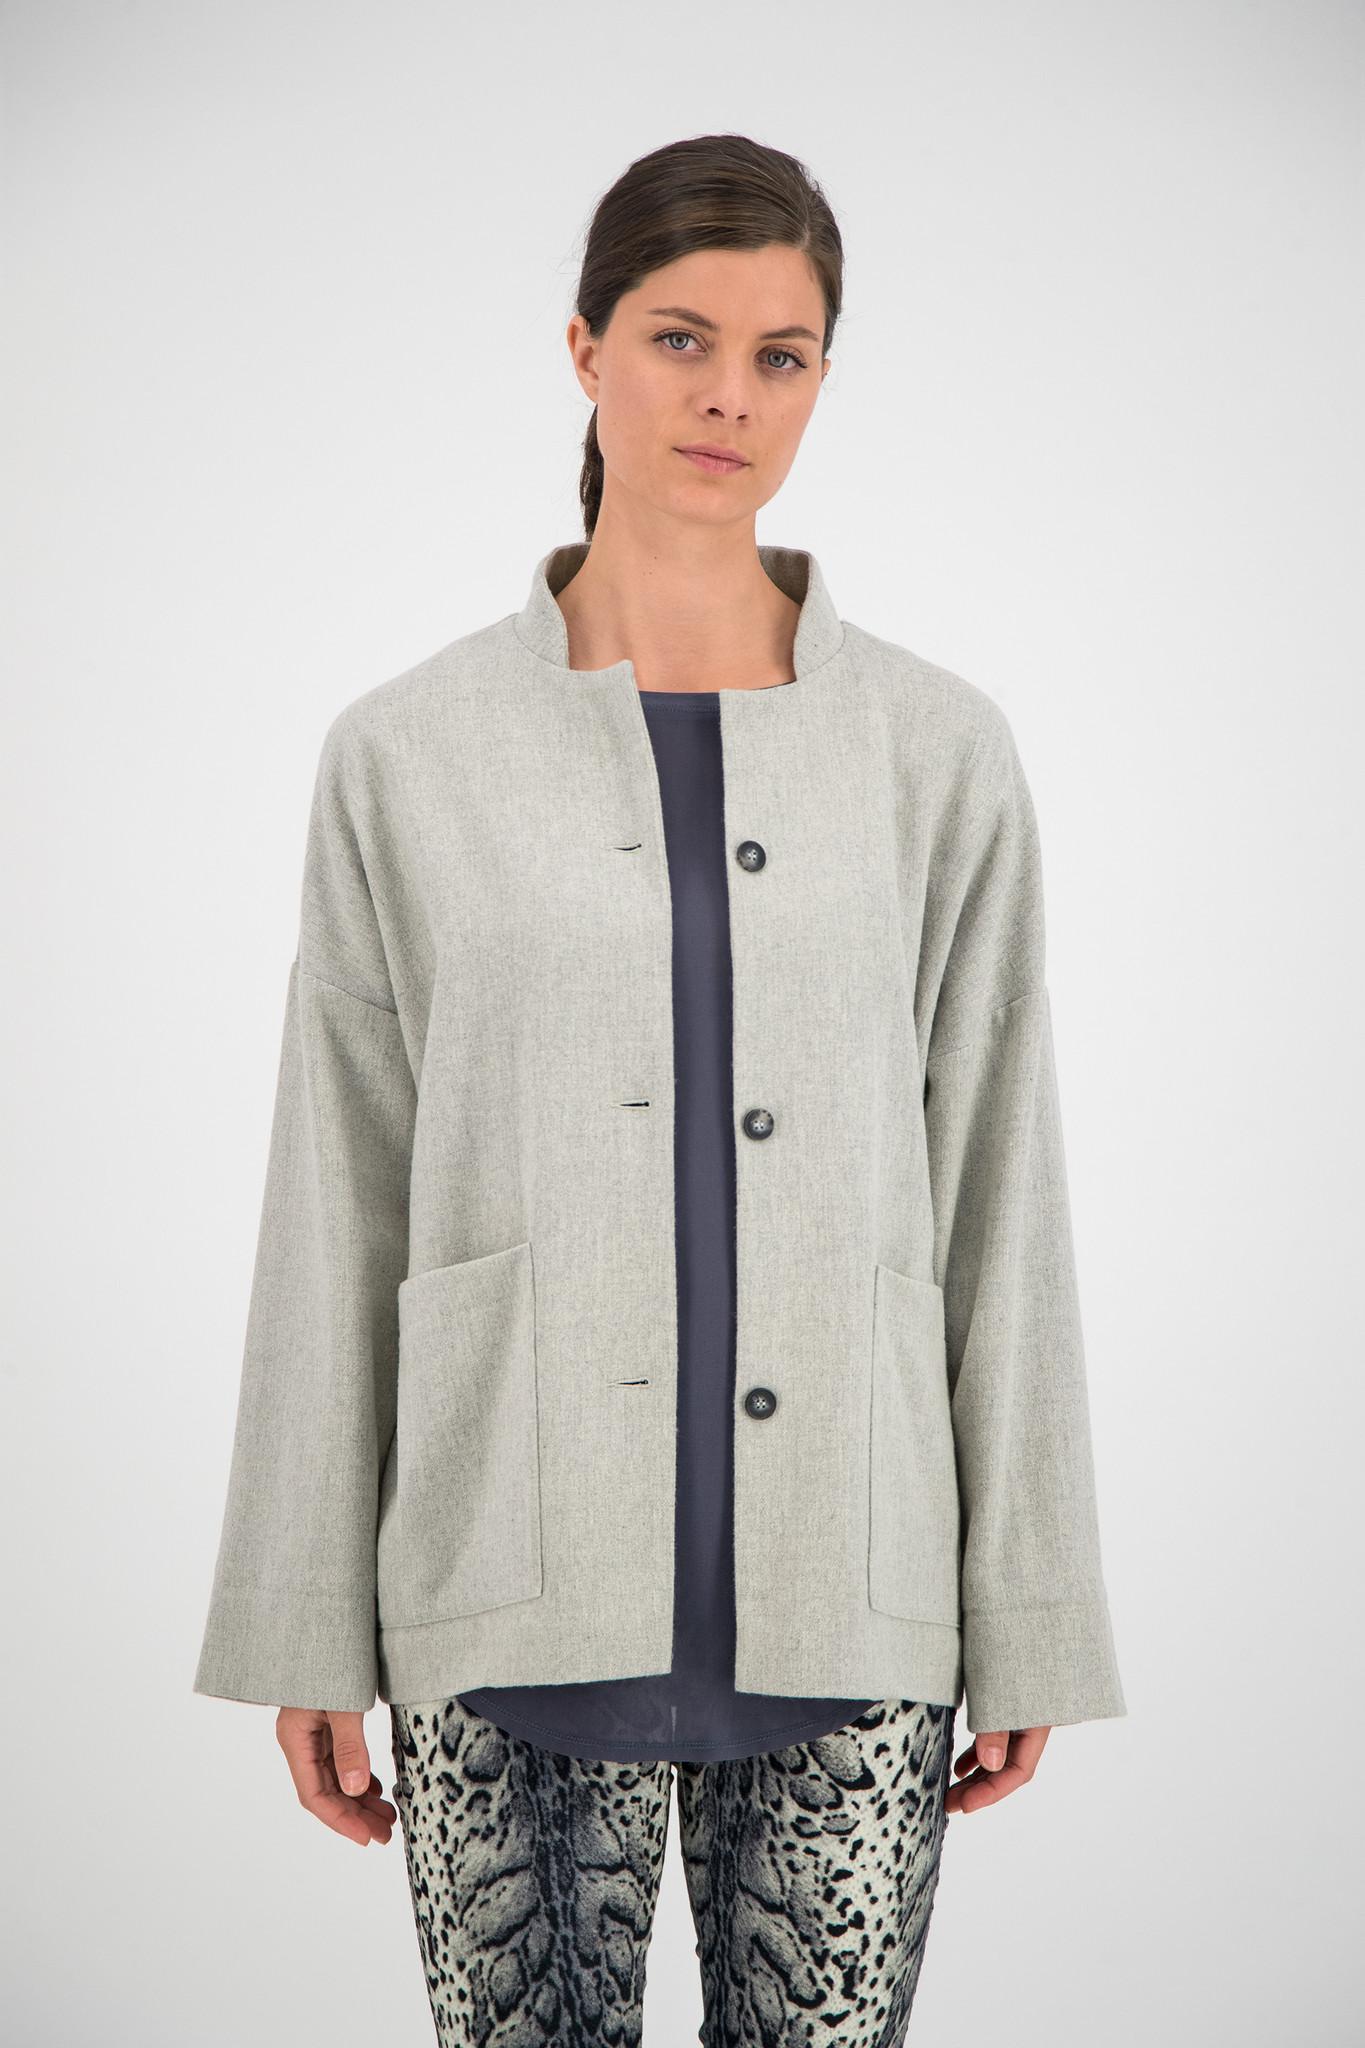 SYLVER Flannel Jacket - Light Grey